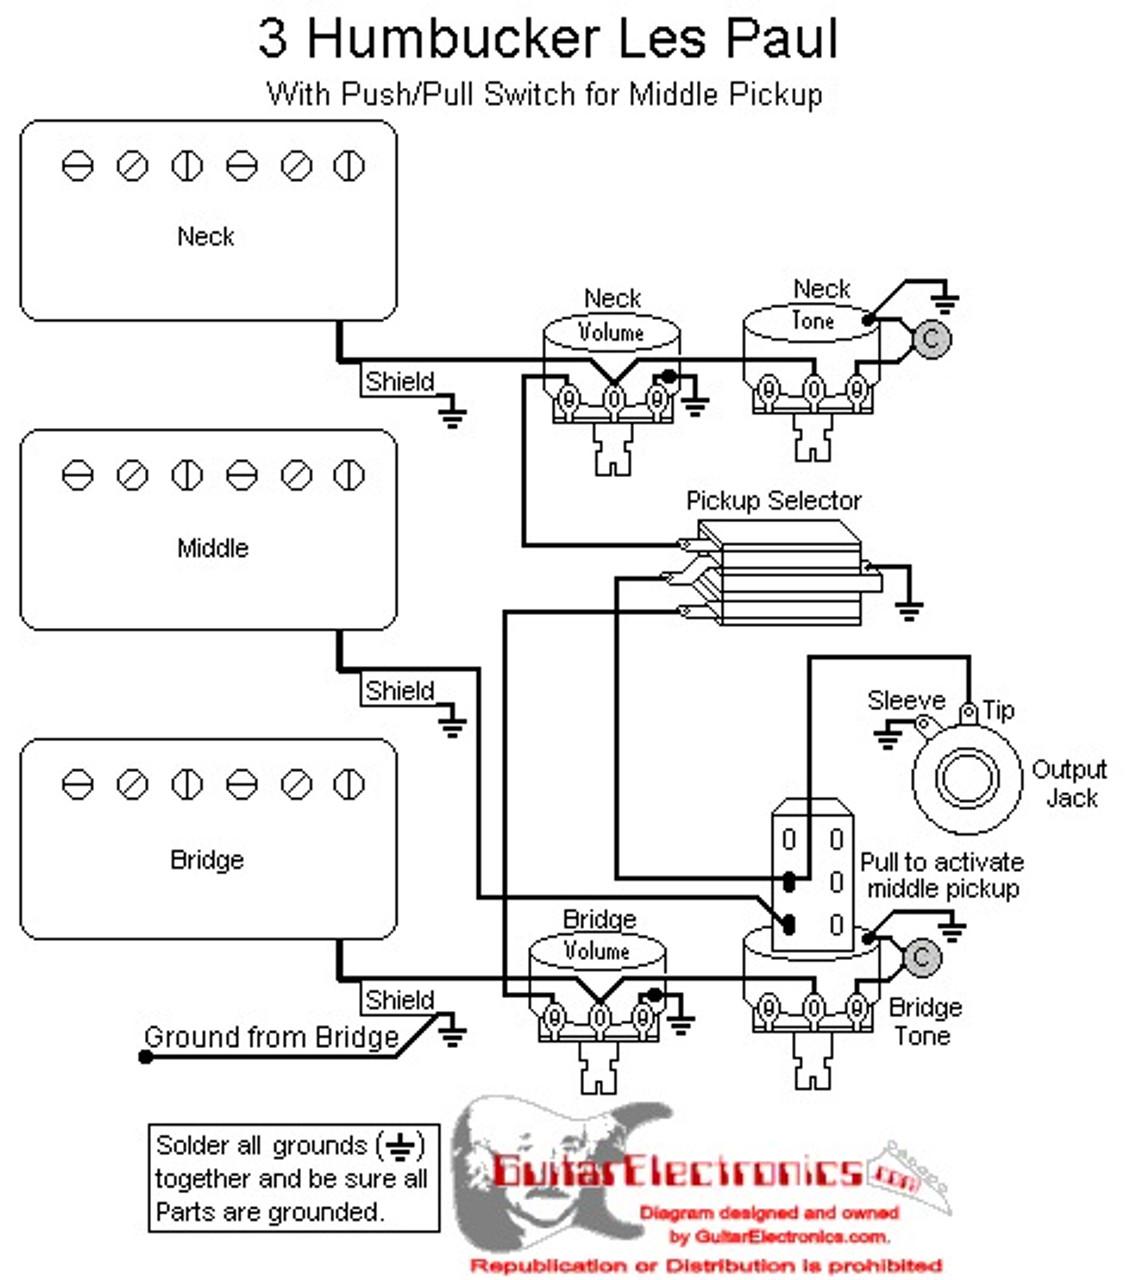 medium resolution of le paul 3 humbucker wiring diagram